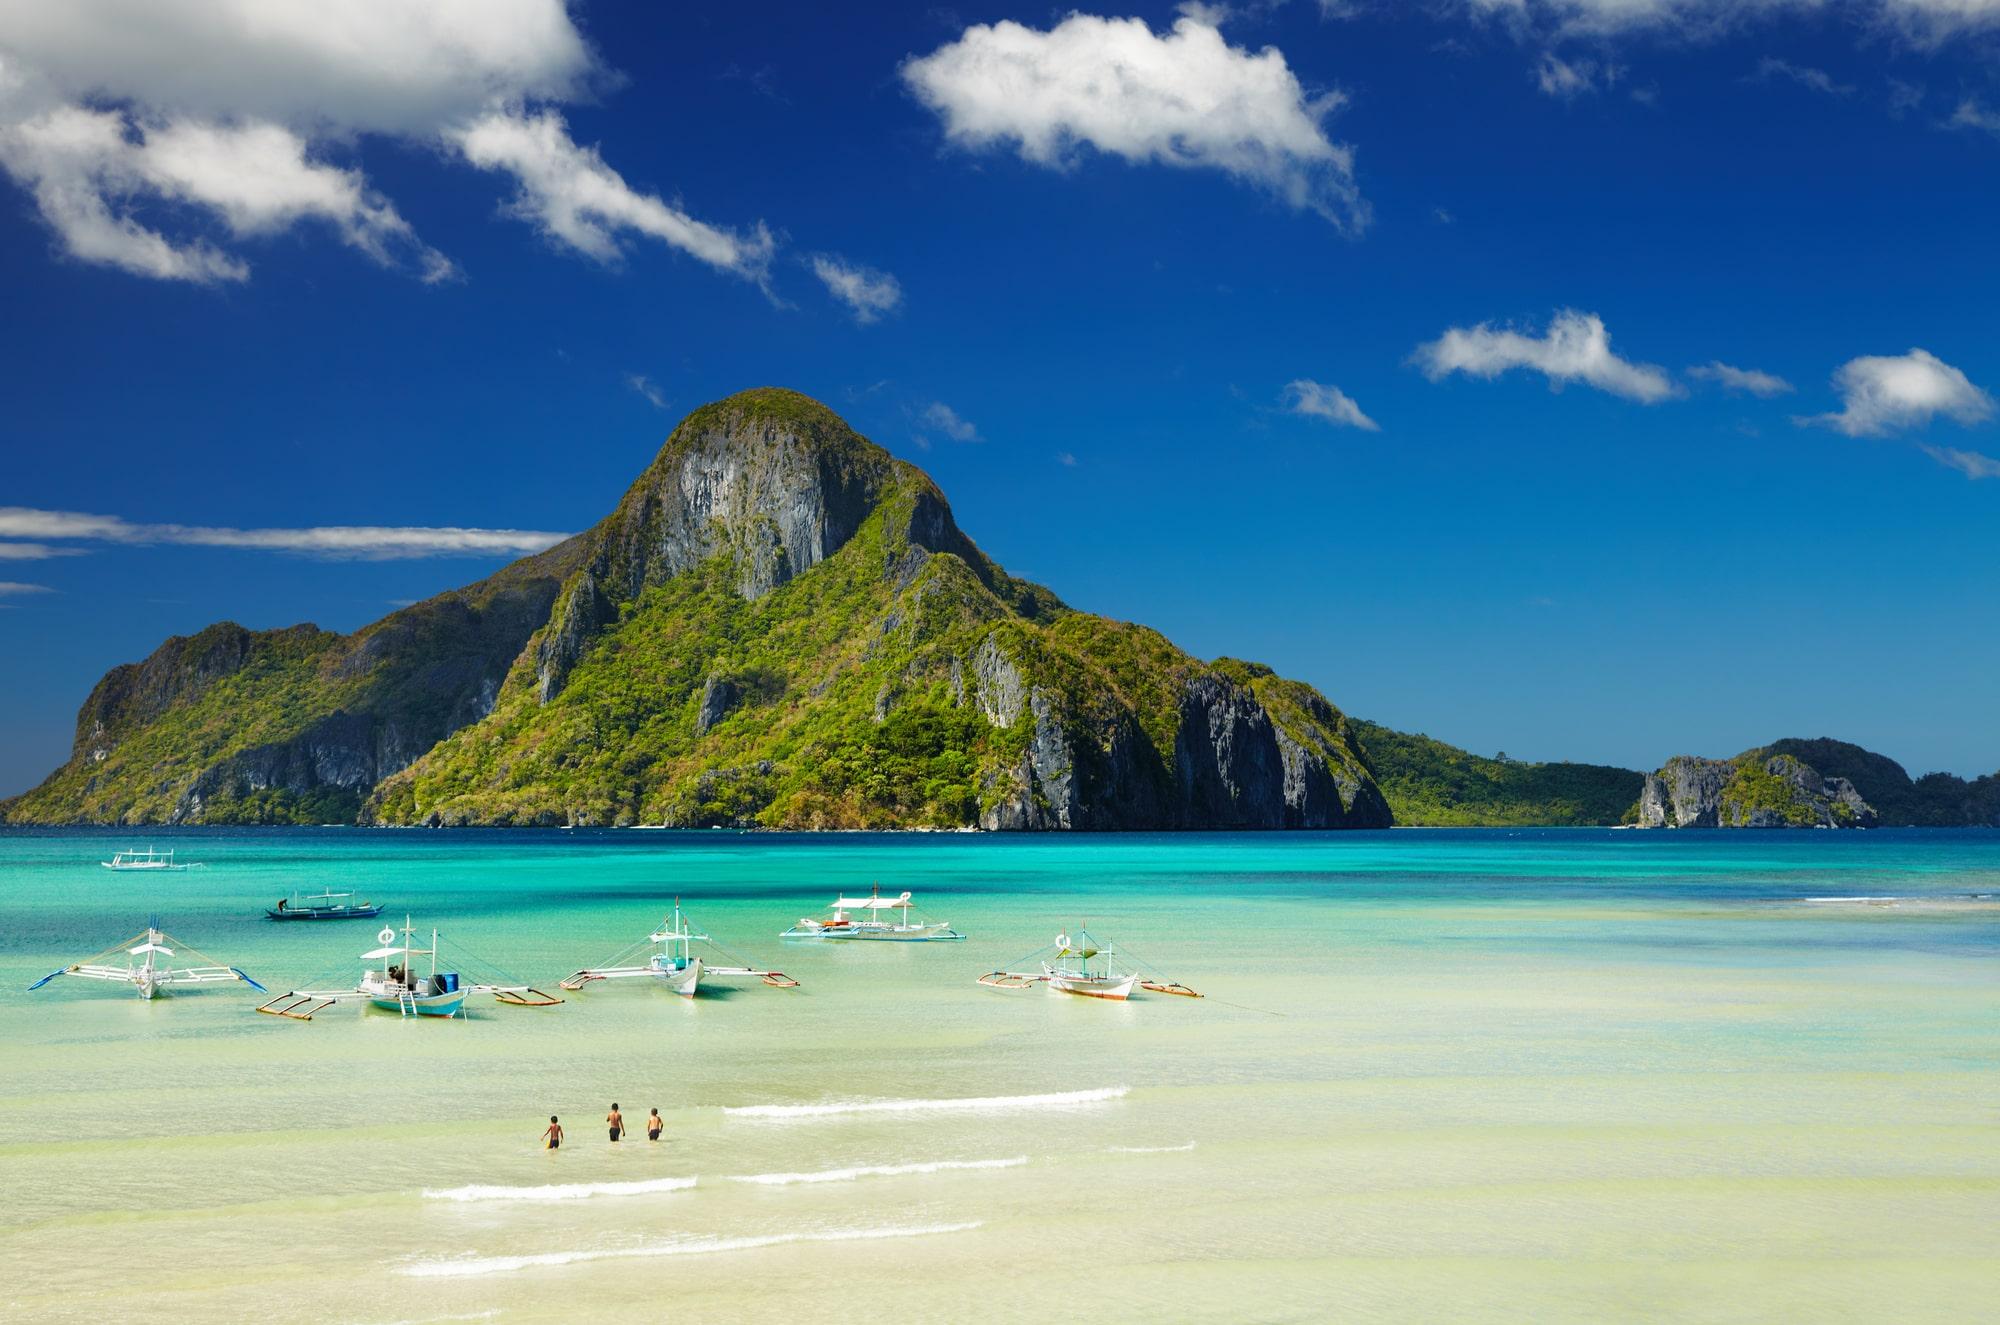 Остров Лусон на Филиппинах